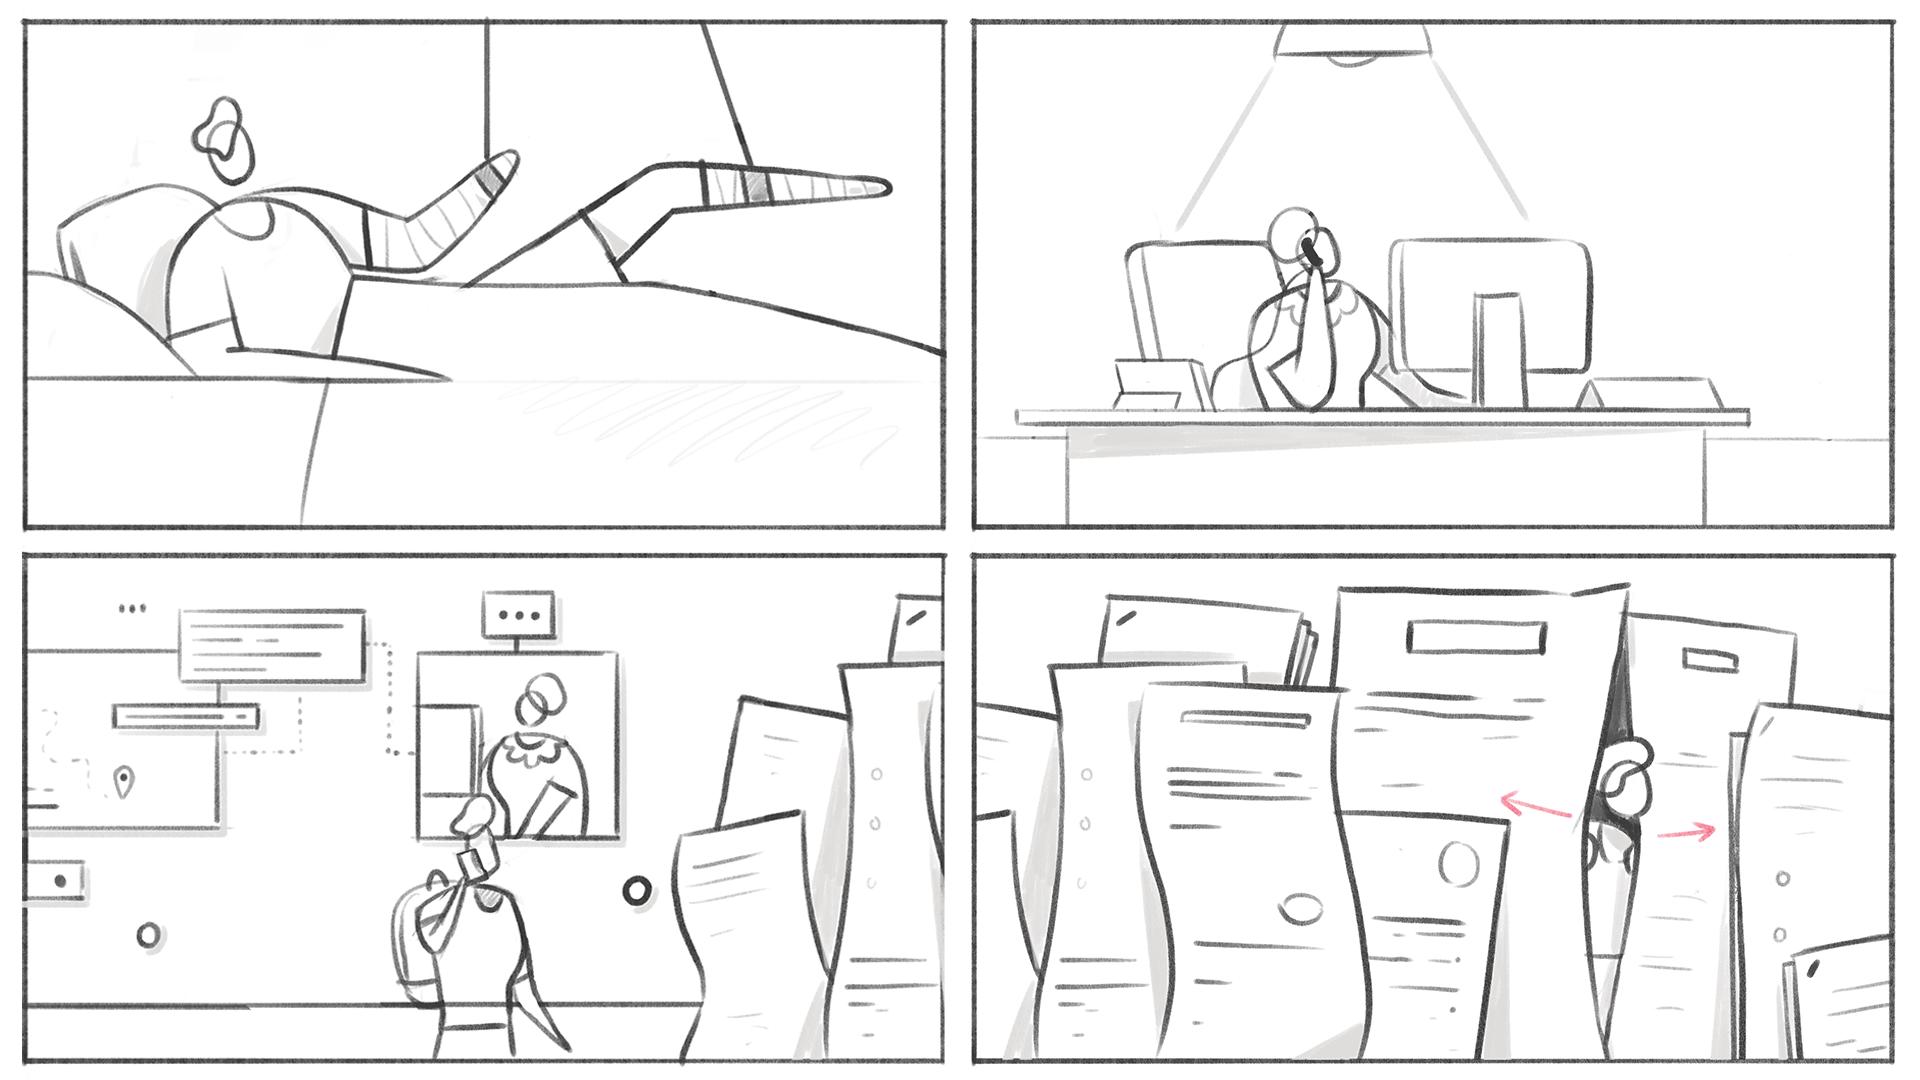 acu-Work_Template-sketchesWork-shot-1.png